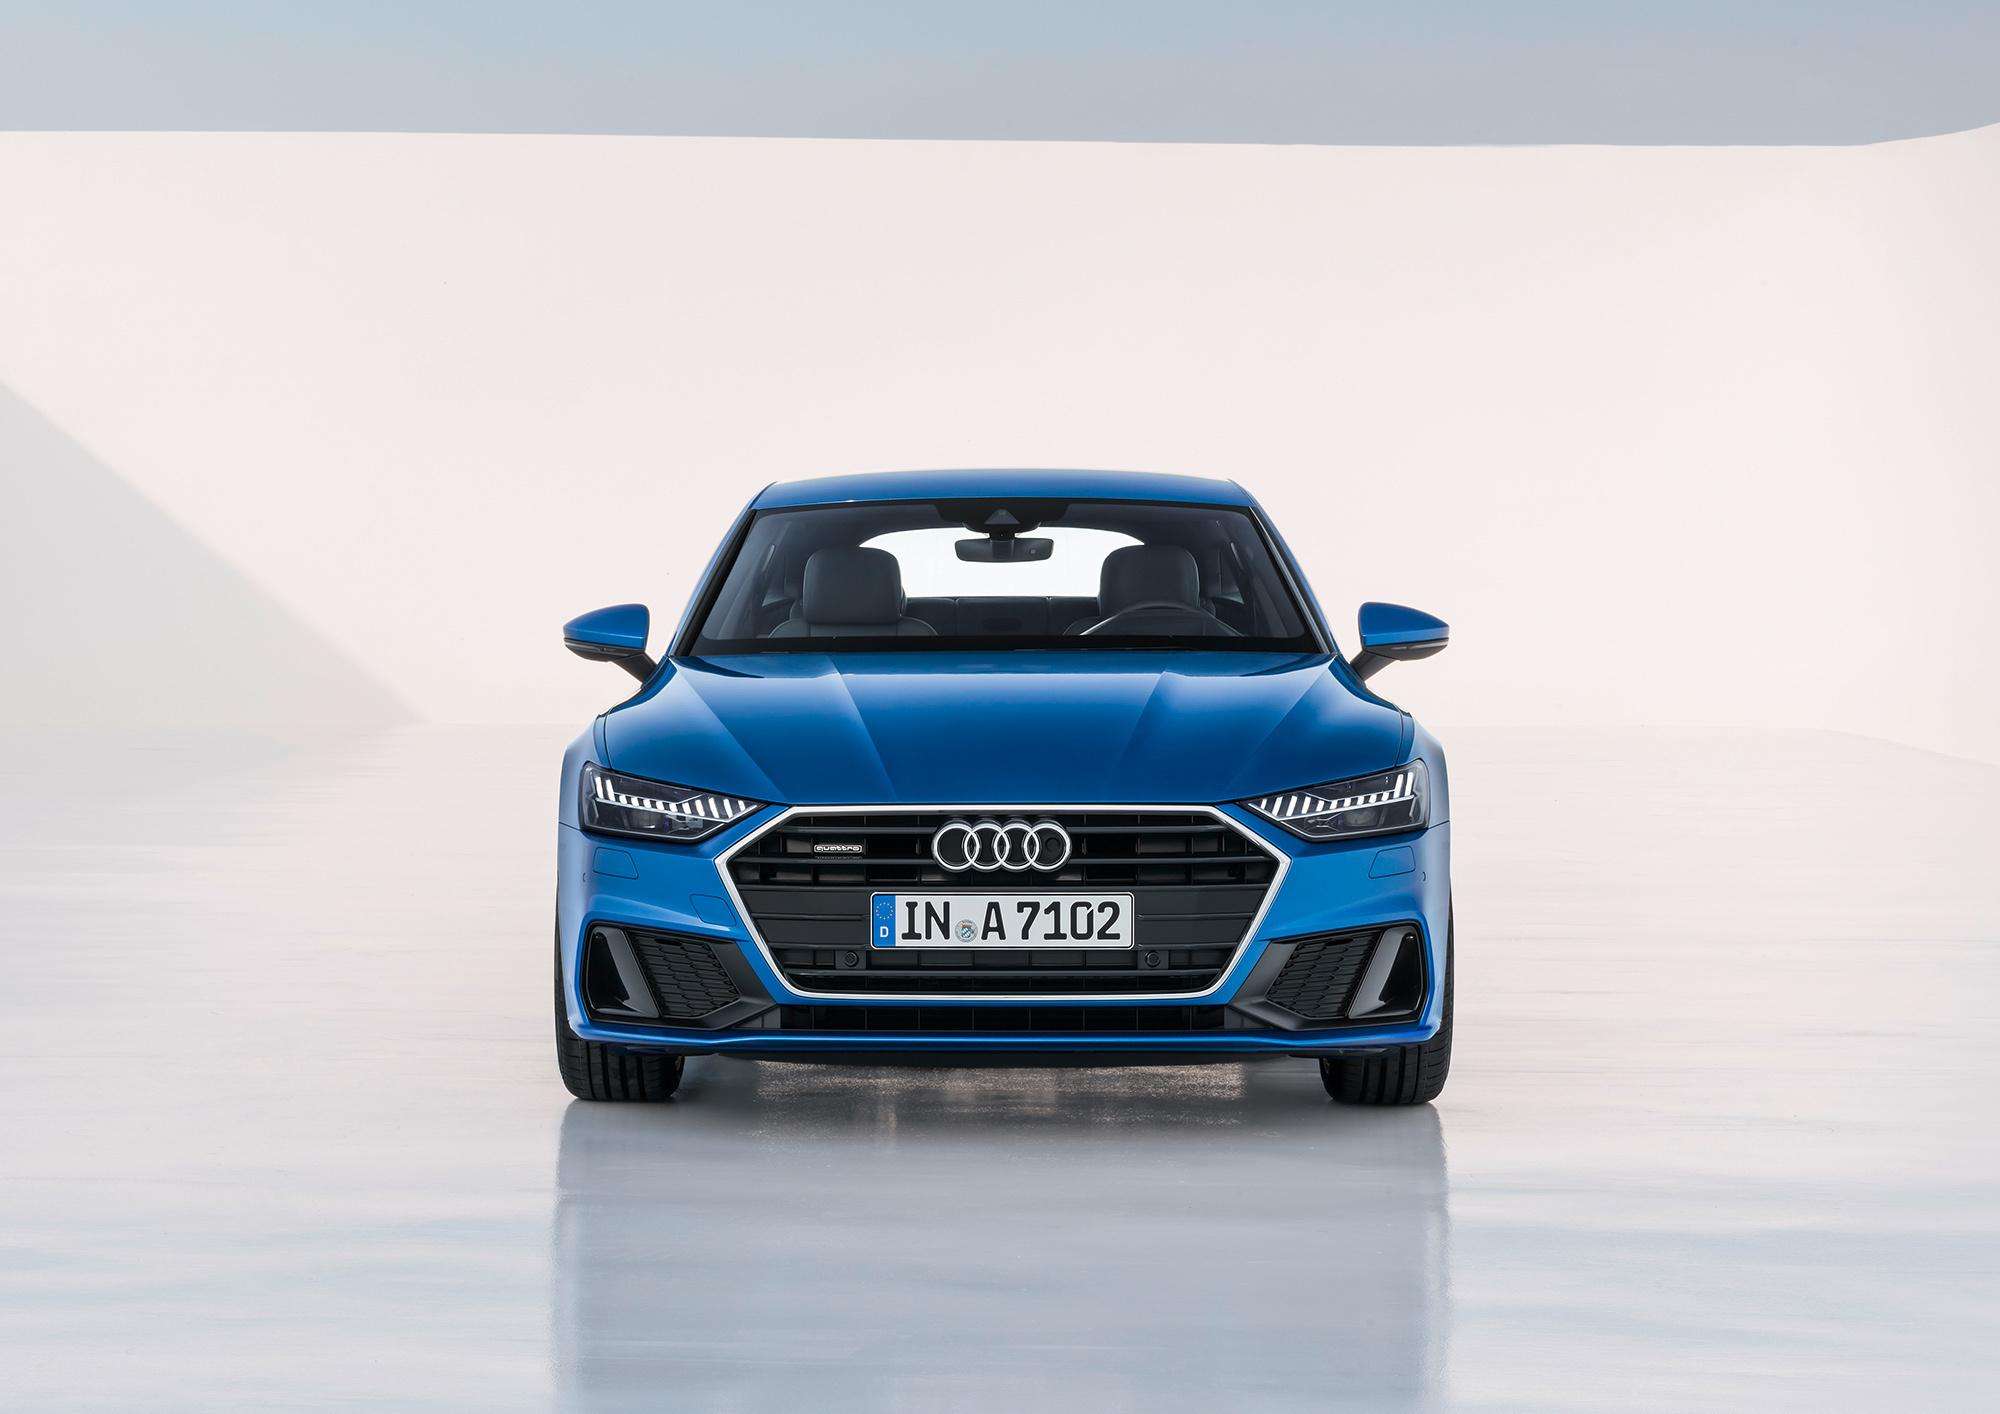 Audi A7 Sportback Wallpapers